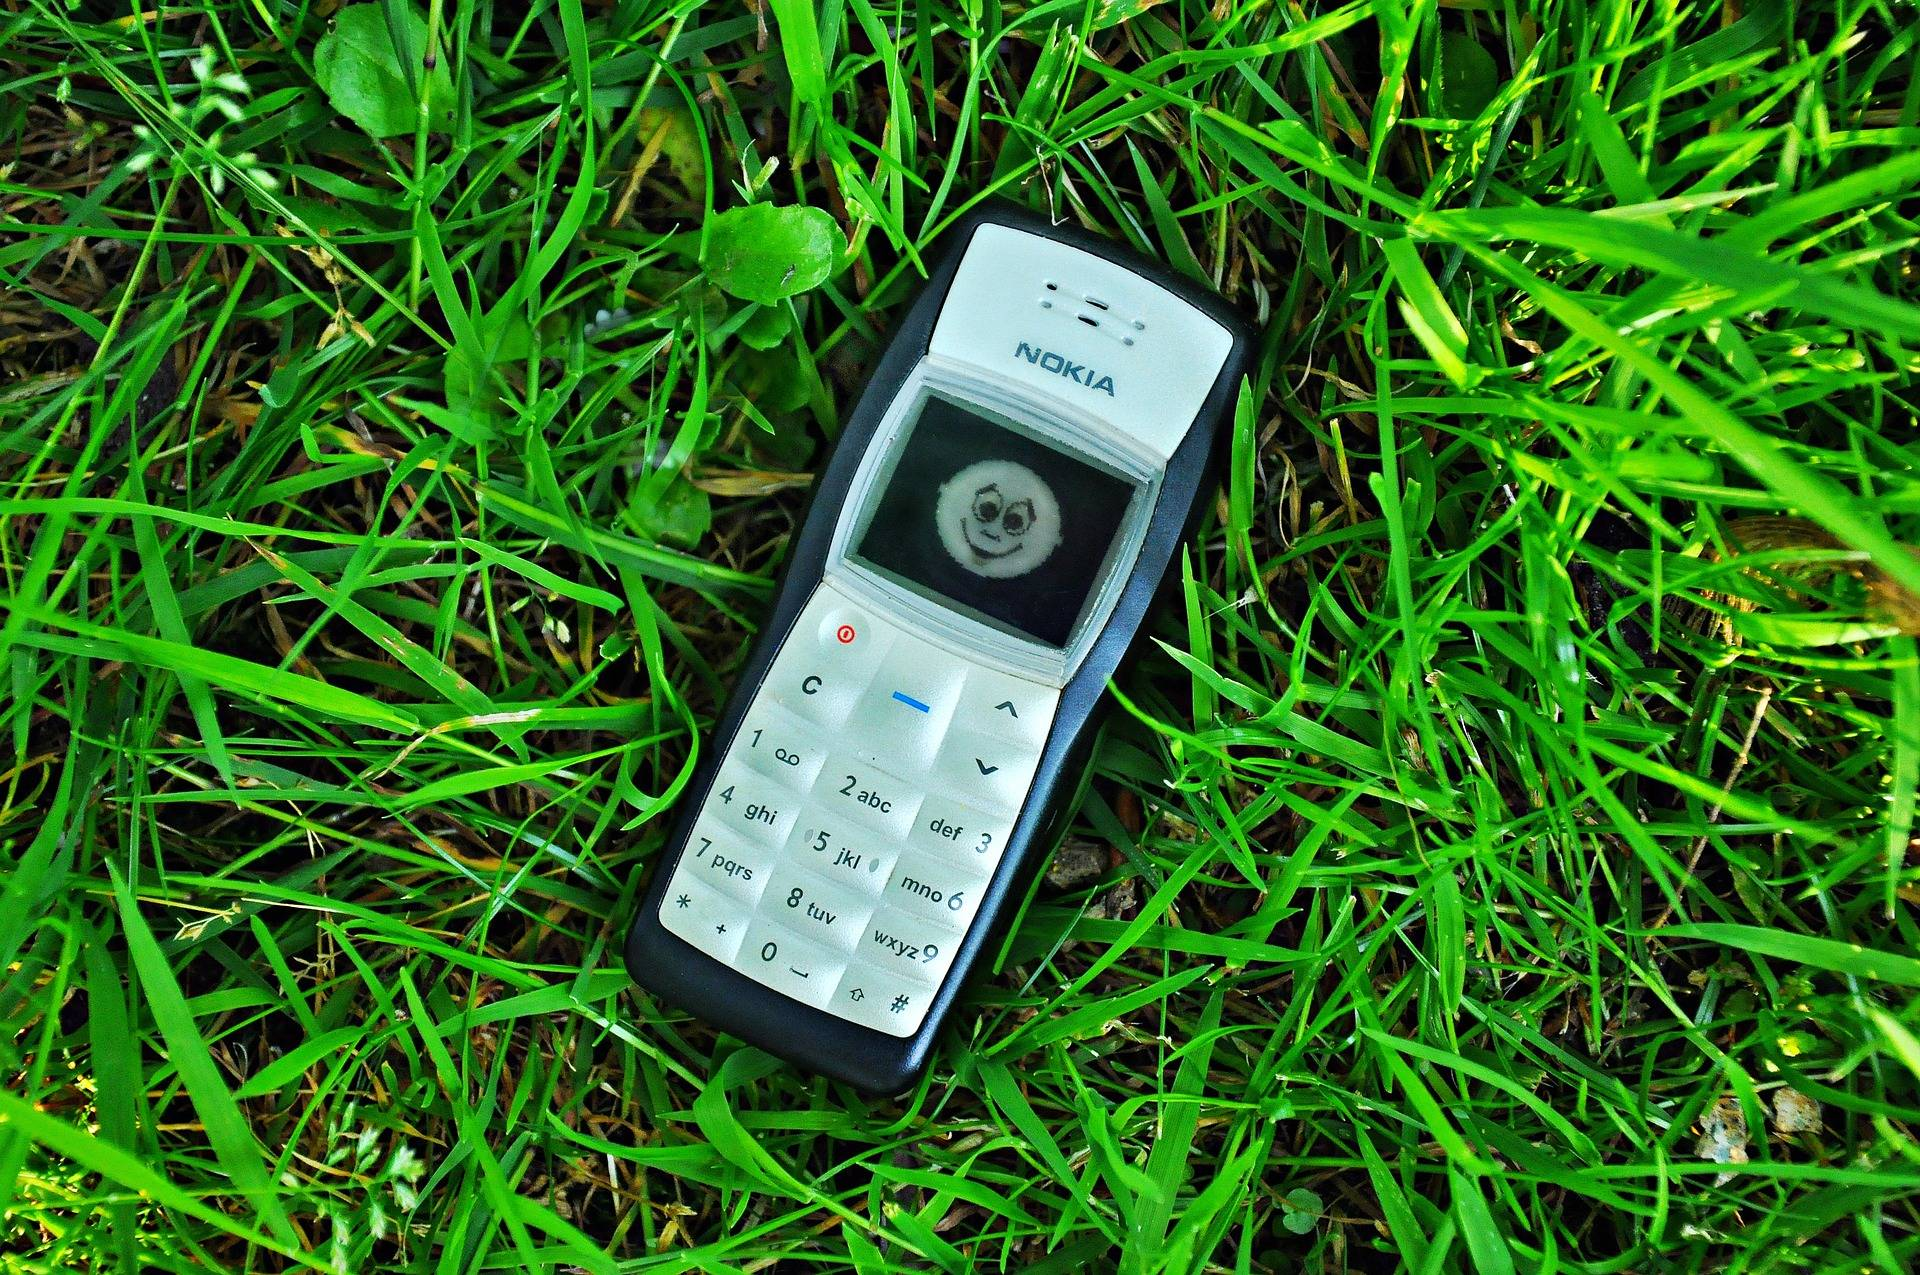 Localizar un celular por gps telcel - Localizar celular por gps yahoo